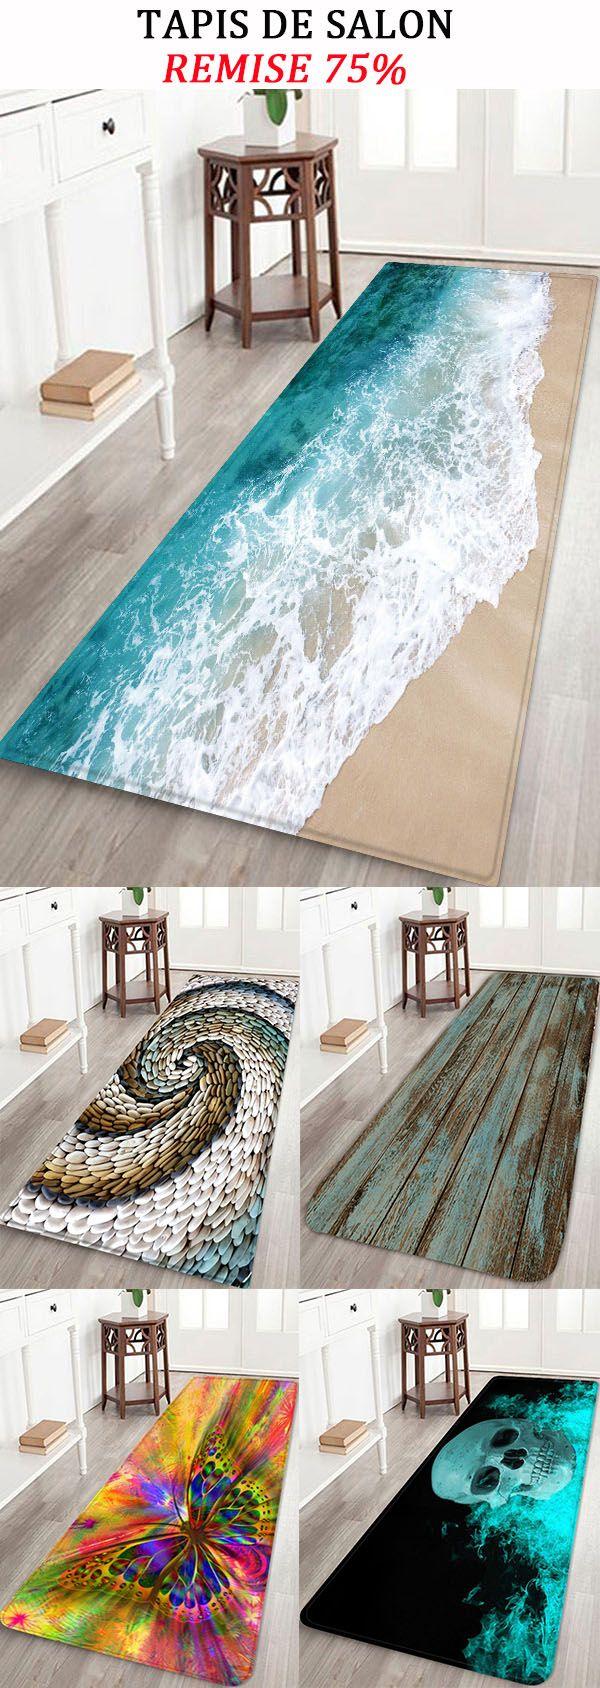 tapis moderne, tapis de salon moderne, tapis salon moderne, tapis ...